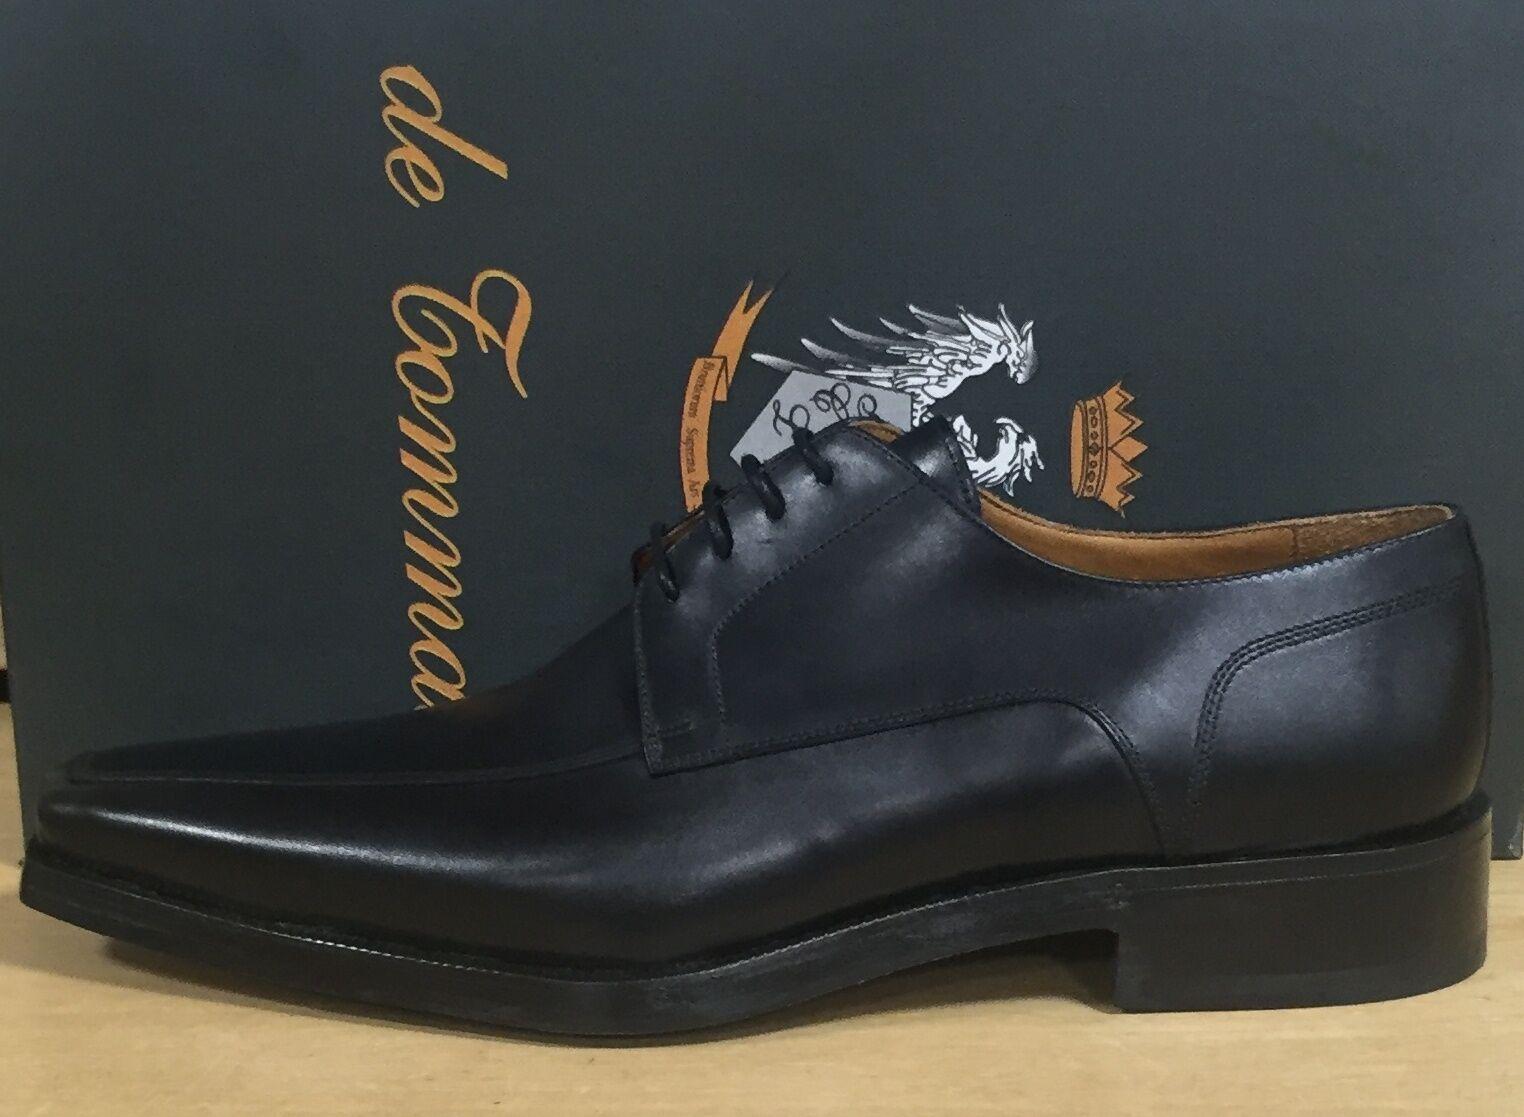 TOMMASO Chaussures élégantes Italy homme made in Italy élégantes d'une grande confection en cuir 2fe16a